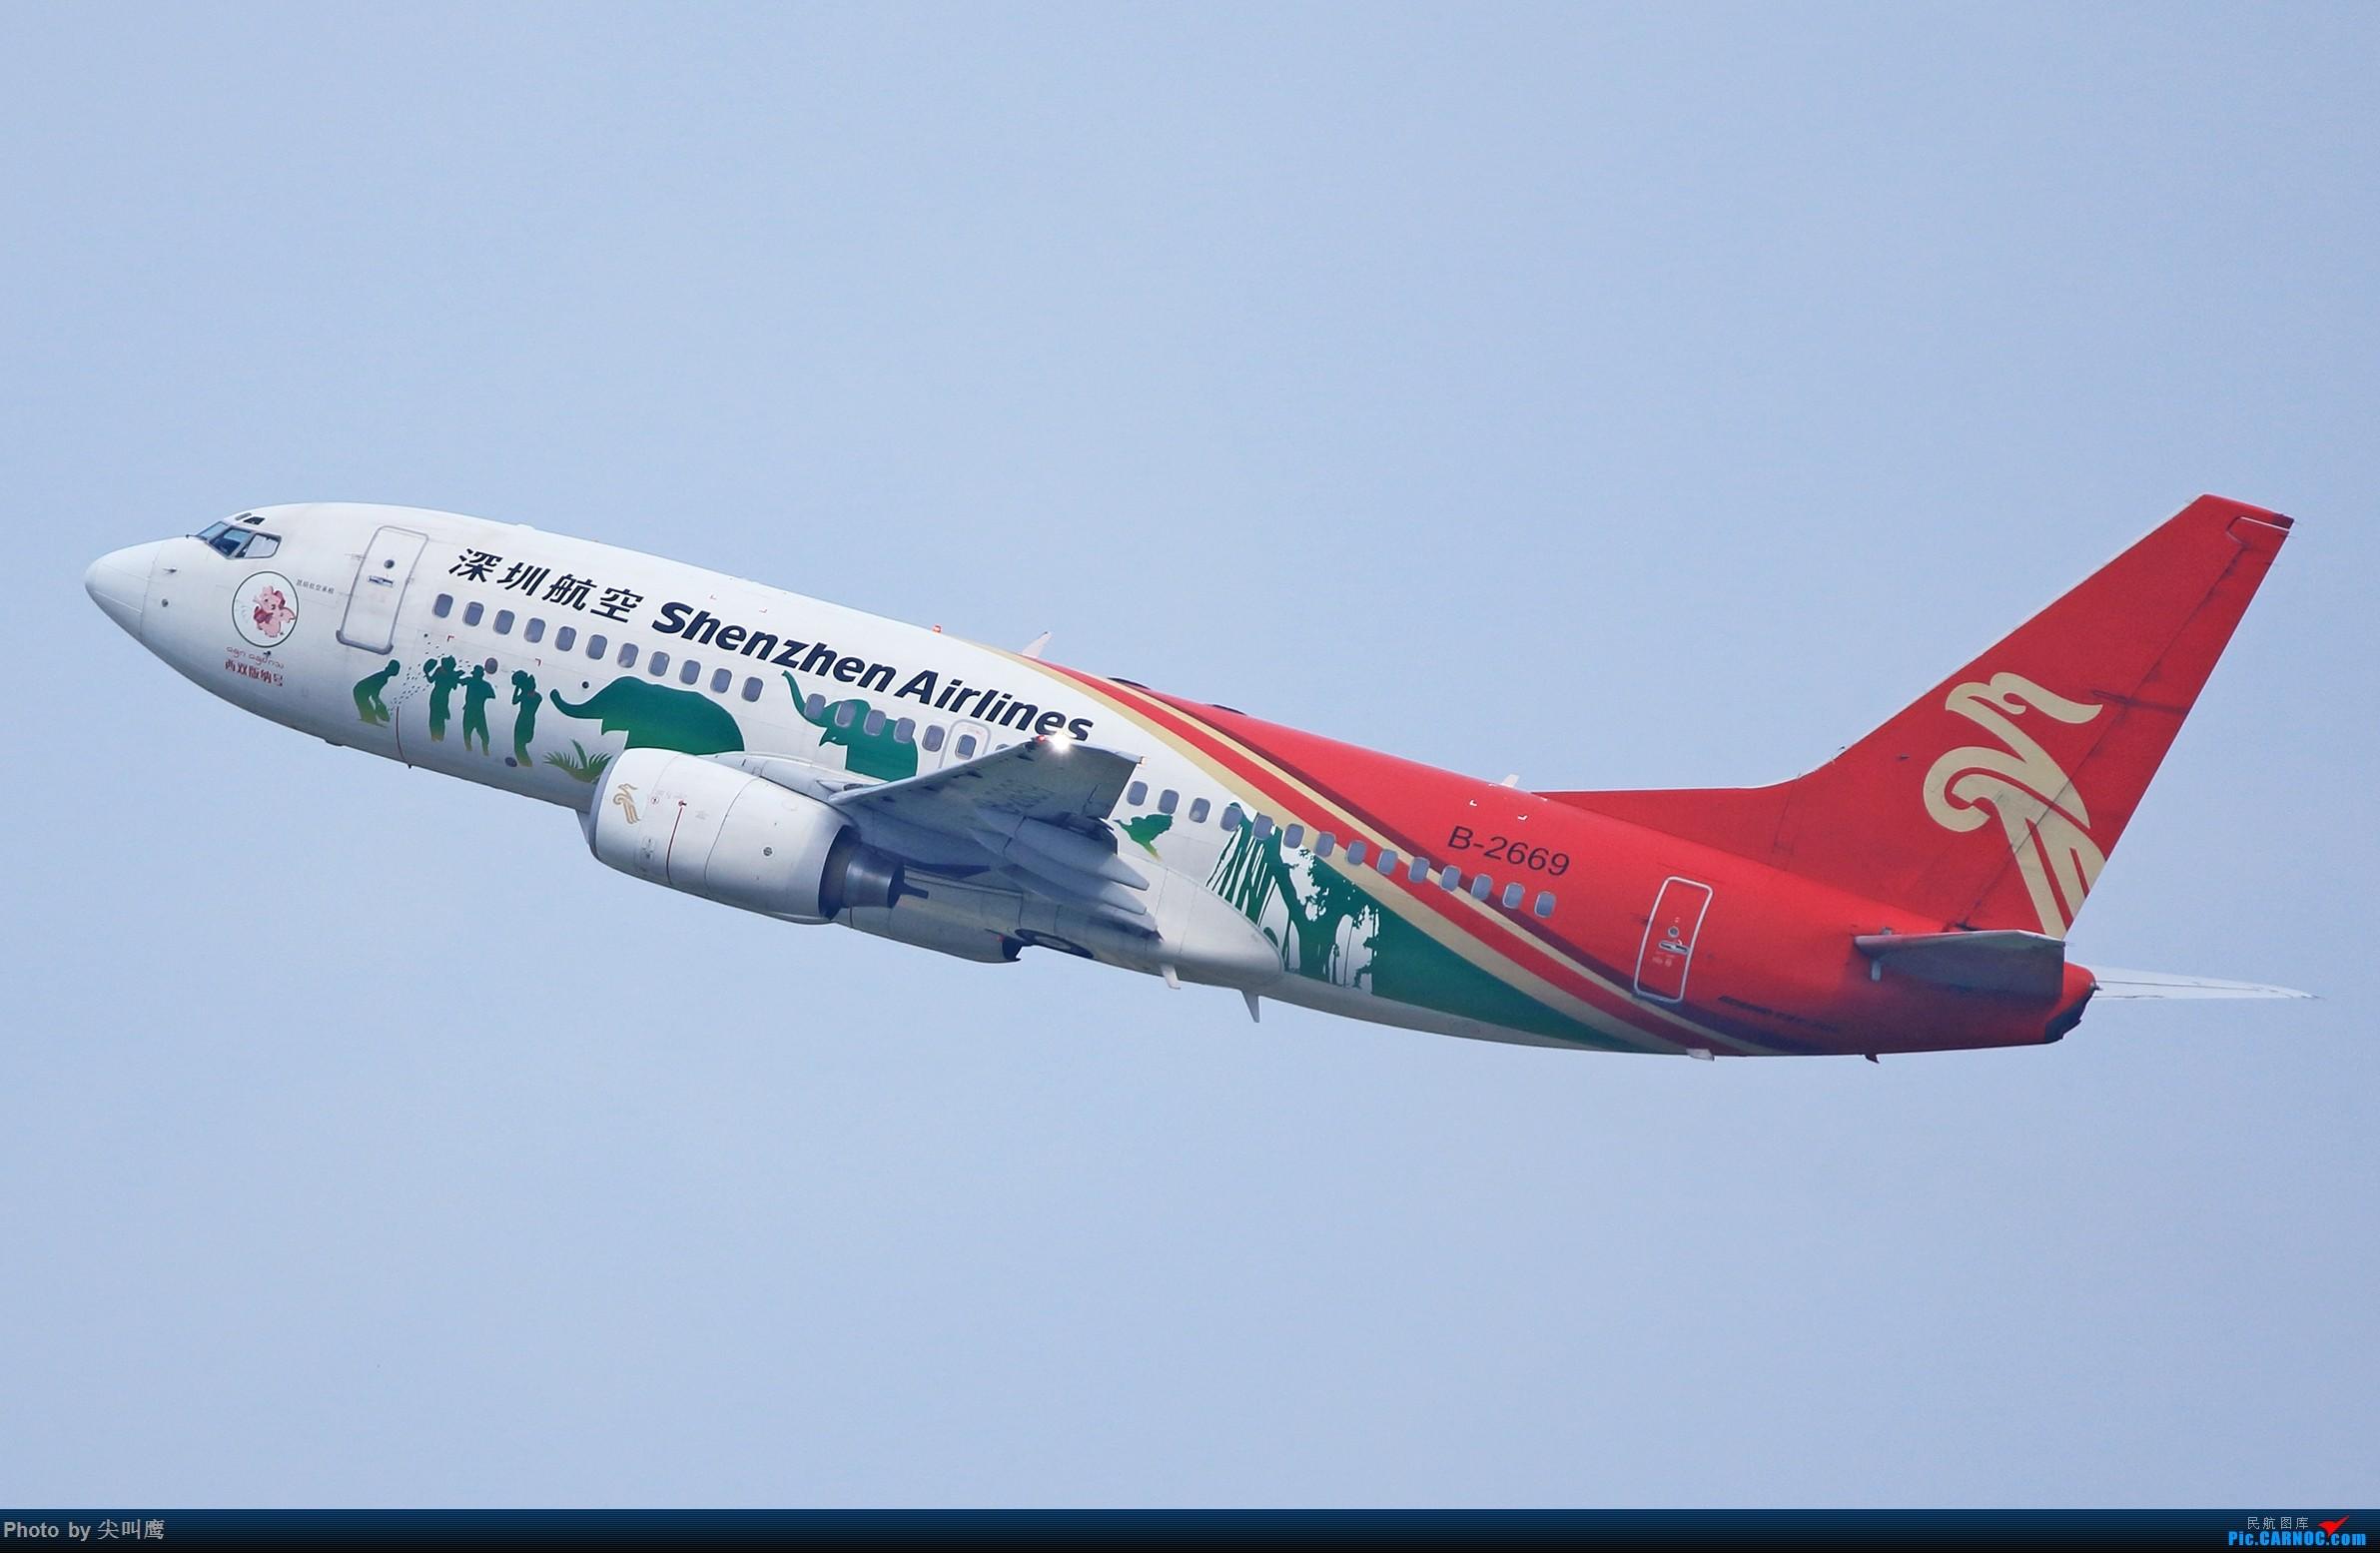 Re:[原创]NNG日常几张杂图 BOEING 737-700 B-2669 中国南宁吴圩国际机场